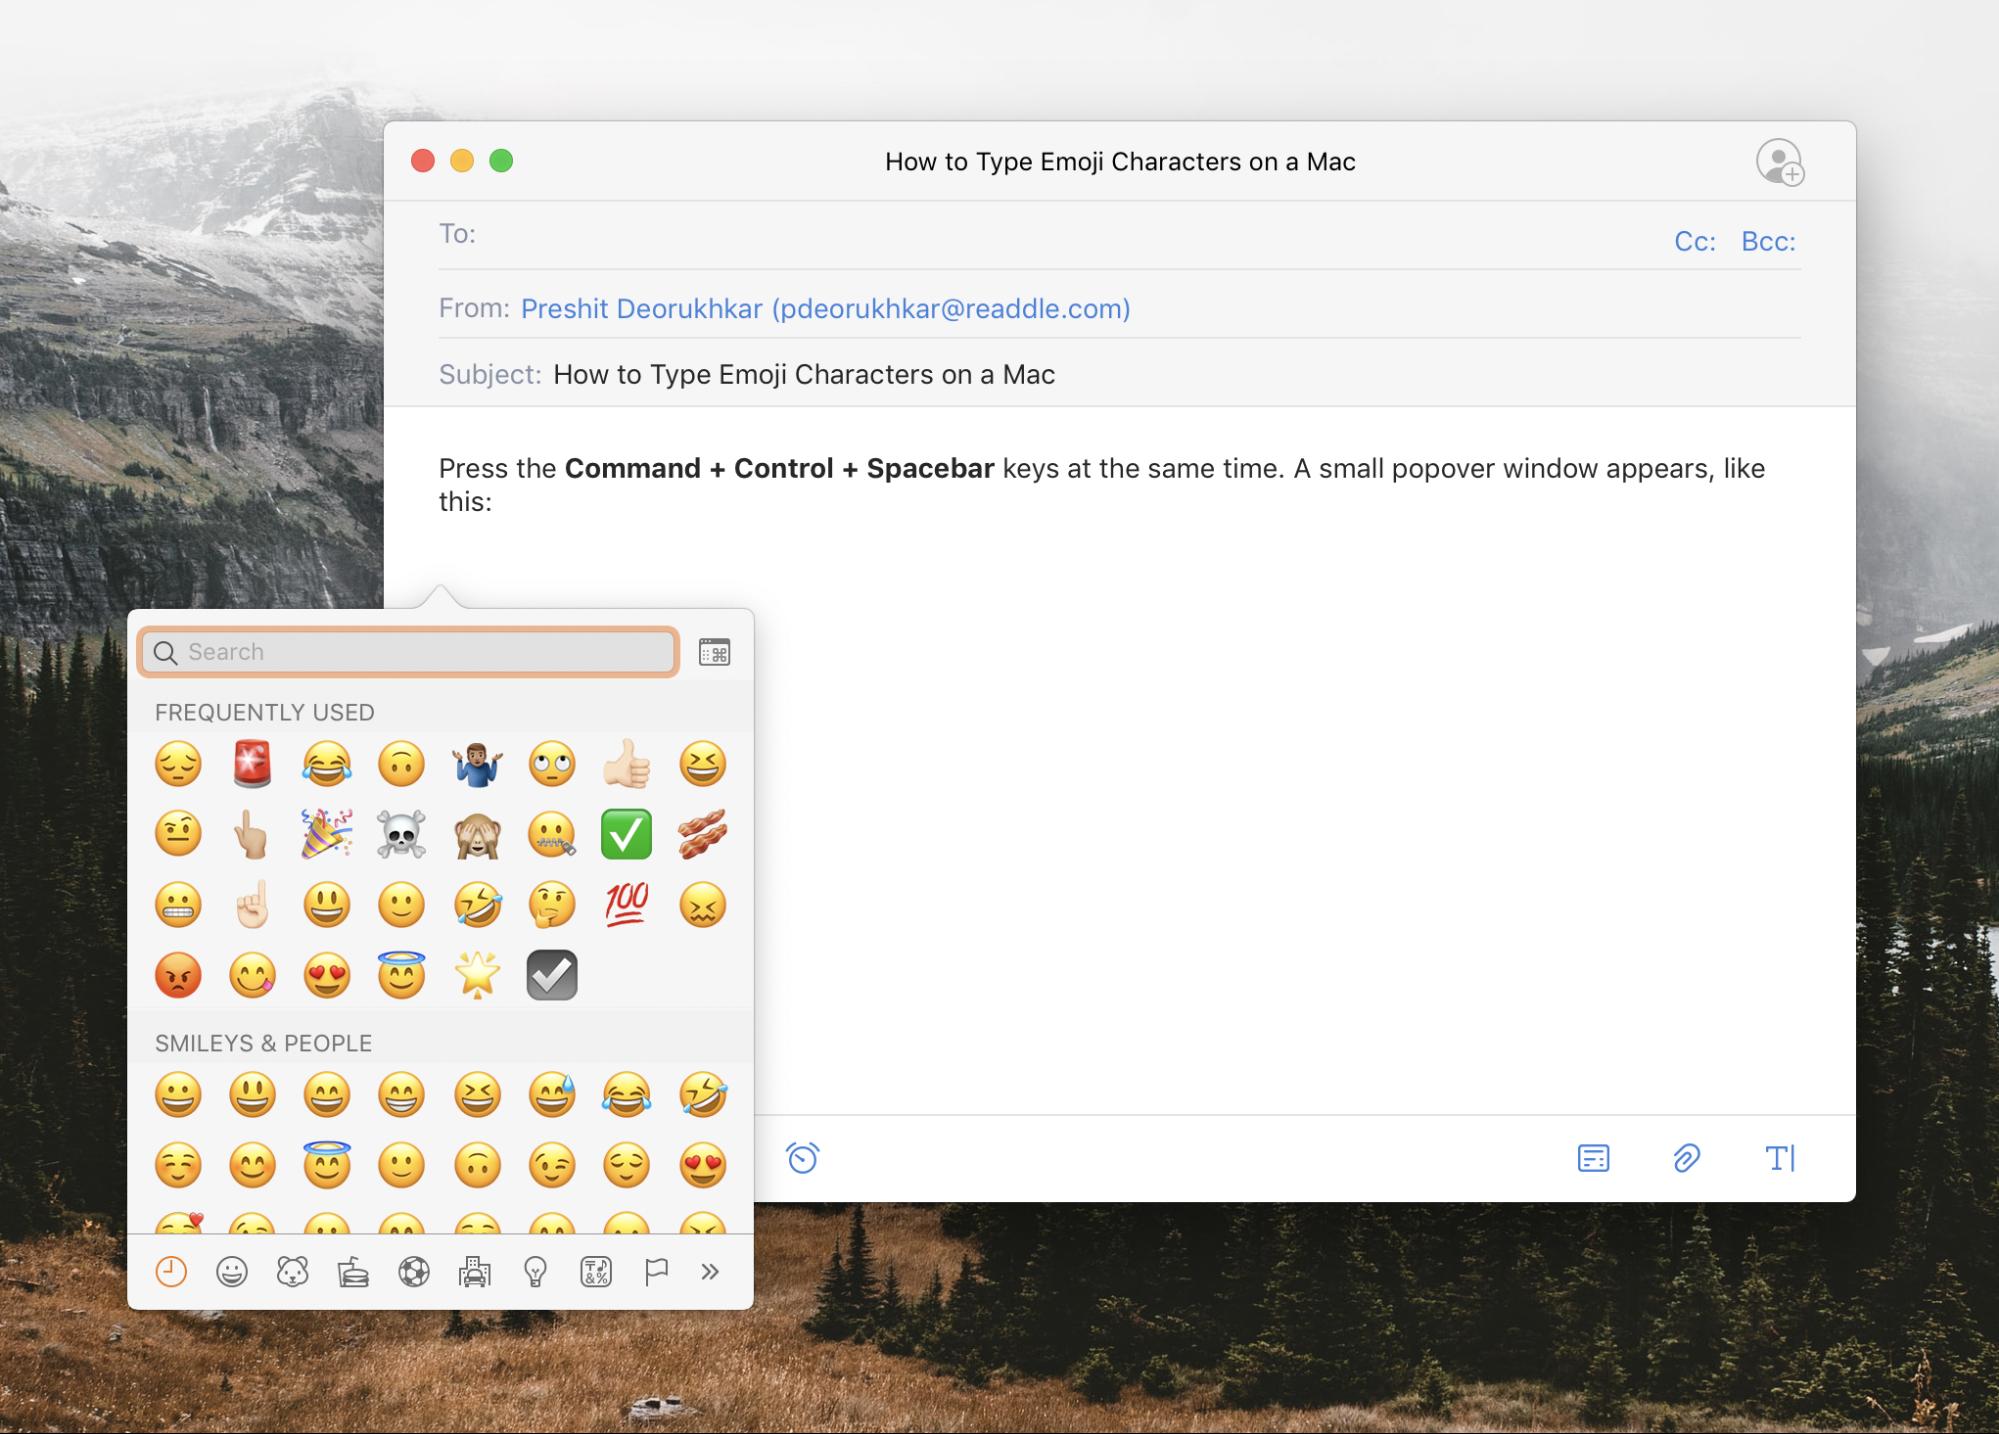 Emoji Keyboard Shortcut for Mac